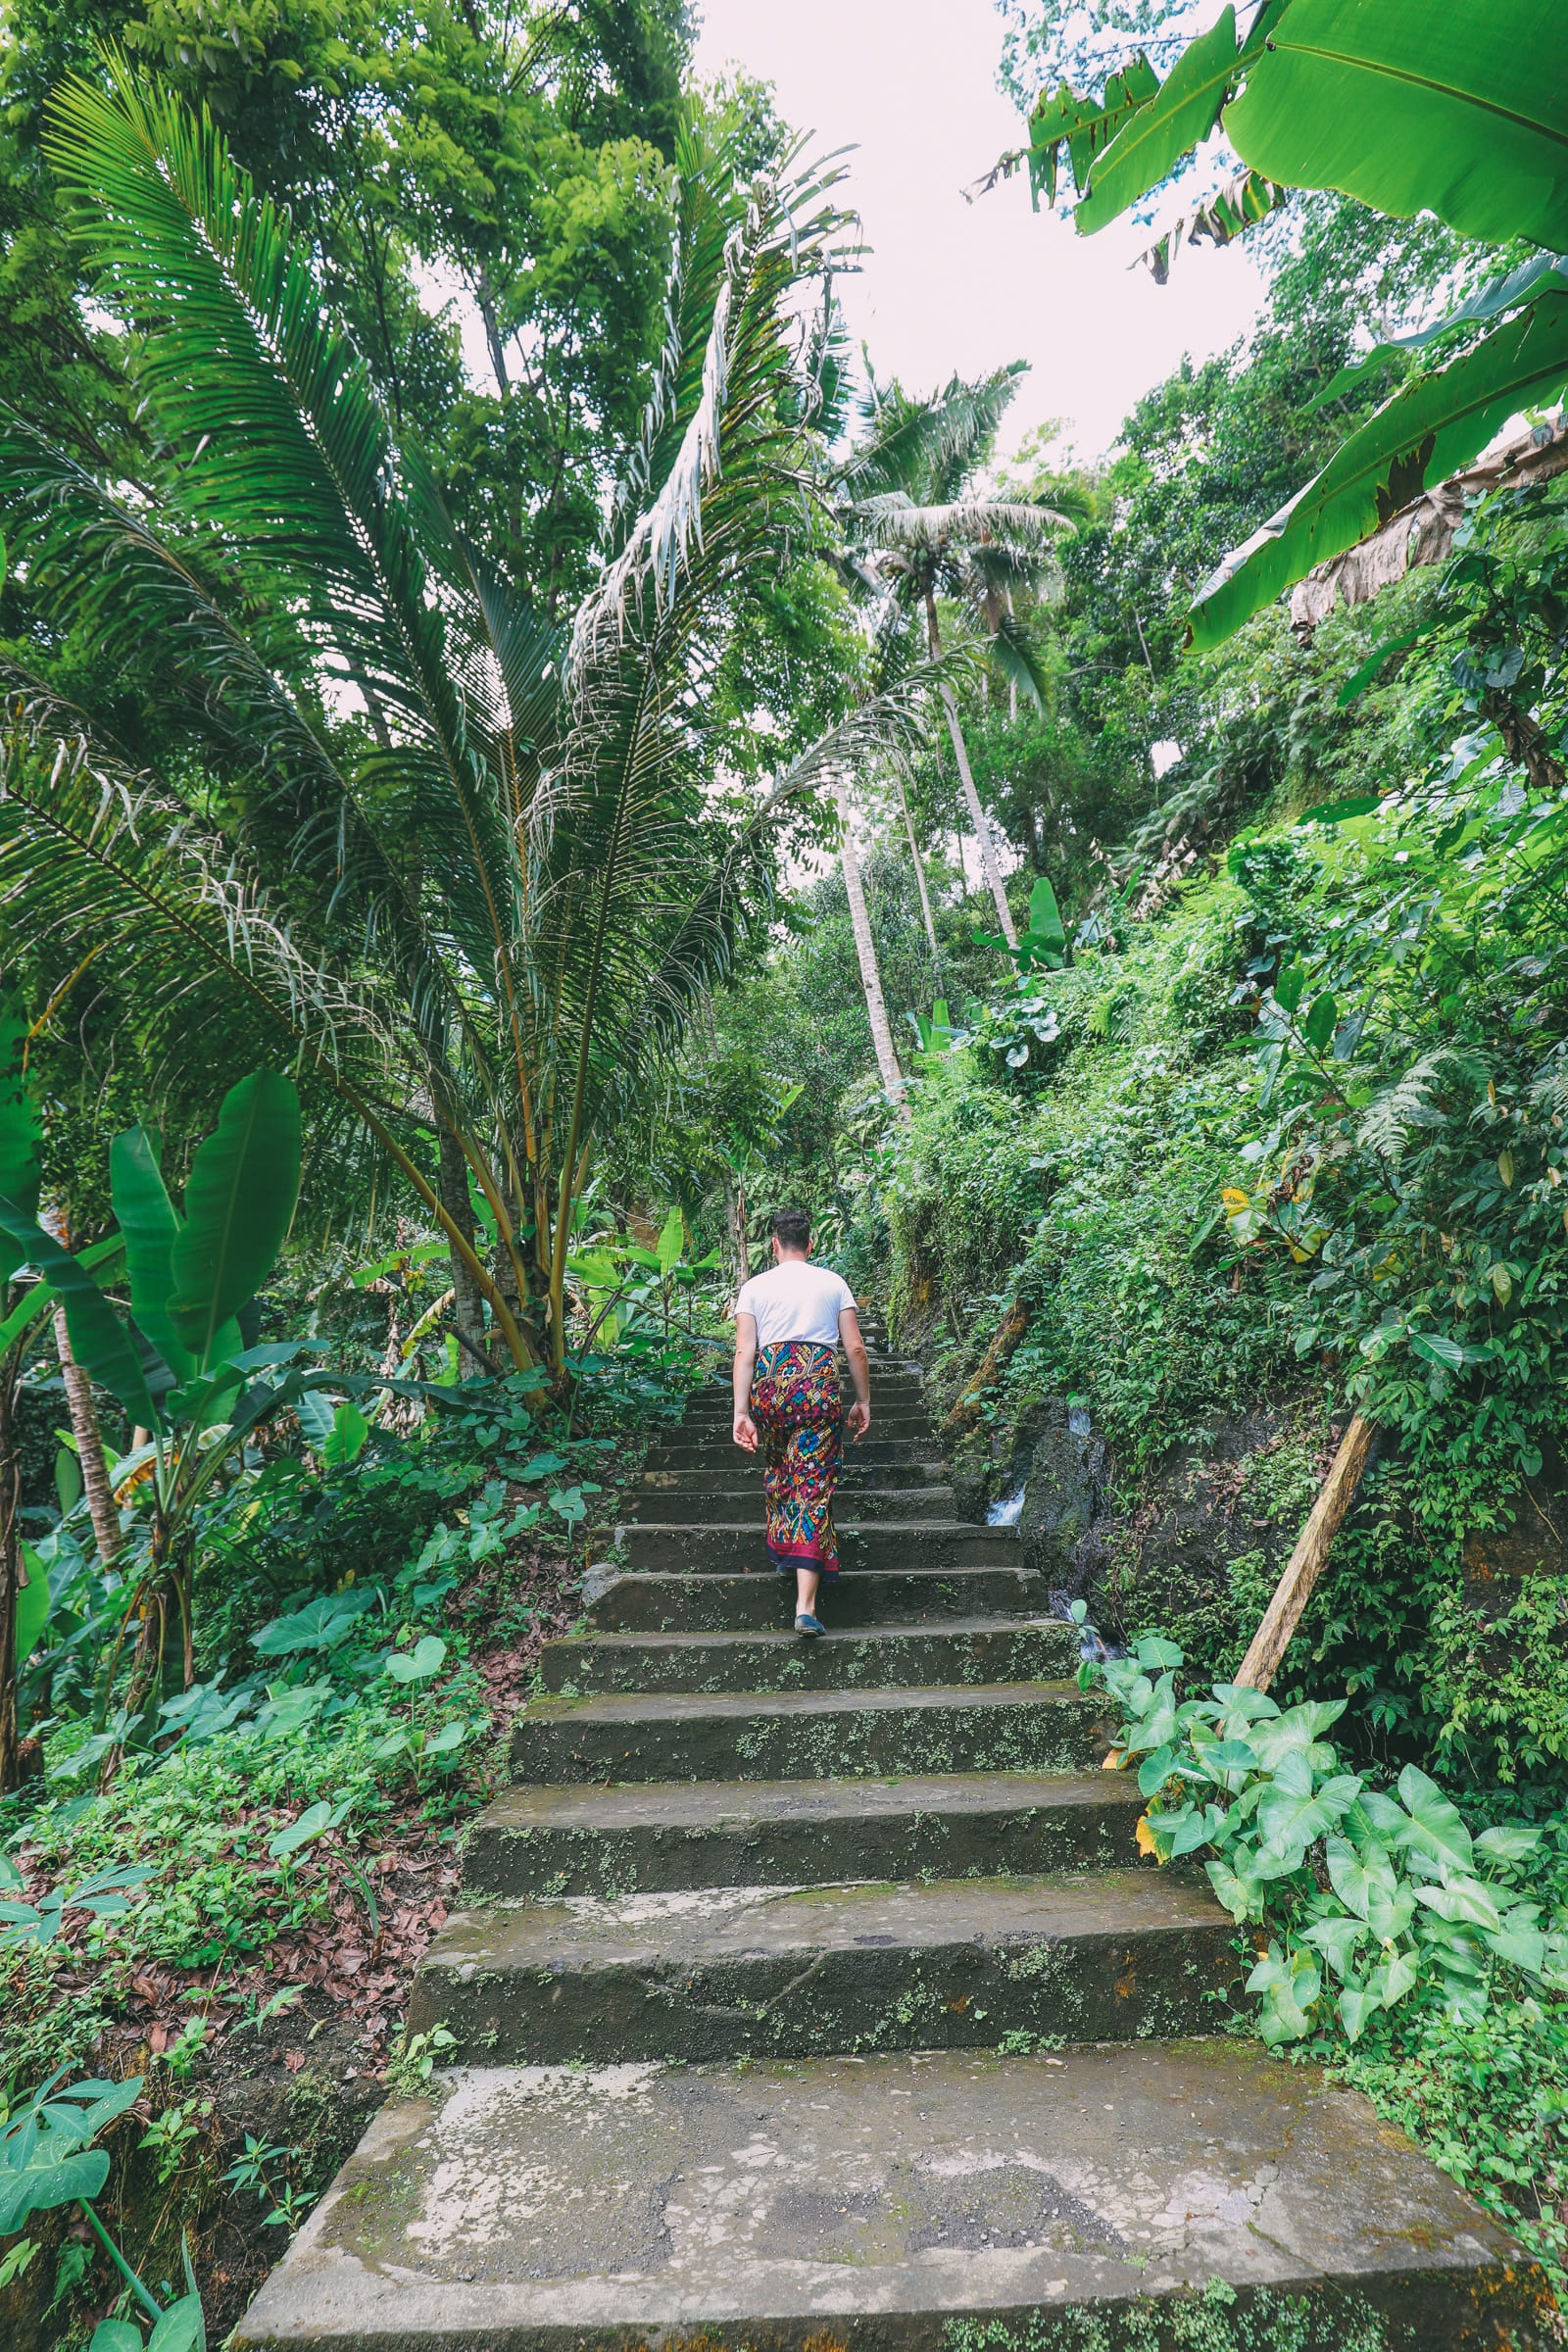 Bali Travel - Tegalalang Rice Terrace In Ubud And Gunung Kawi Temple (40)